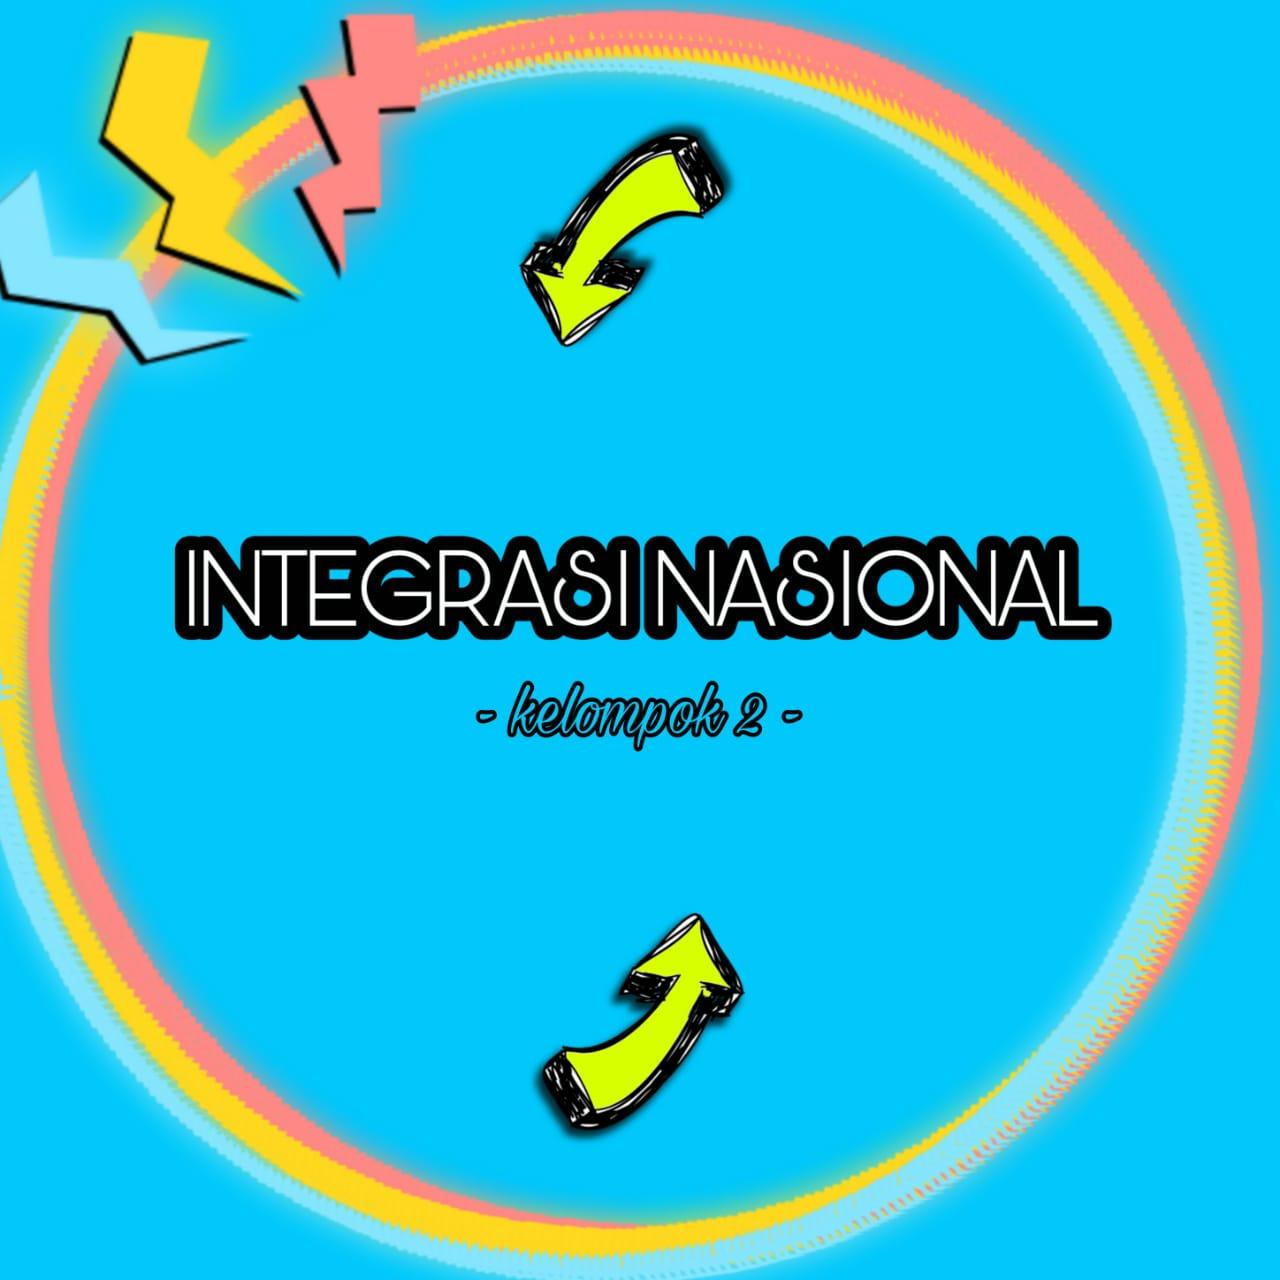 Integrasi Nasional Kelompok 2 Quiz Quizizz